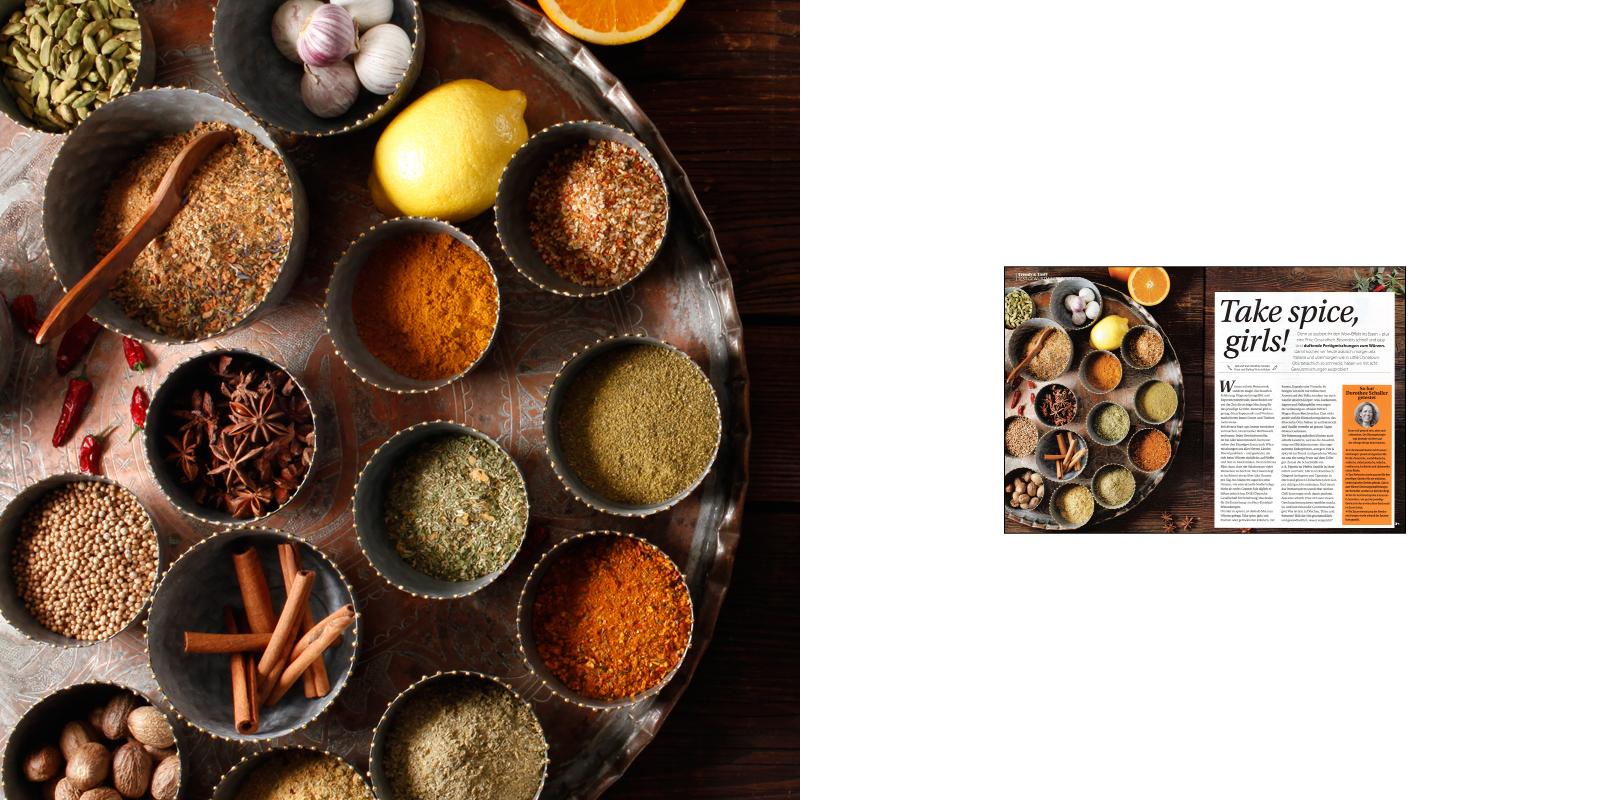 Victoria Huber Stuttgart Inszenierte Fotografie Foodfotografie Foodstyling Gewürze